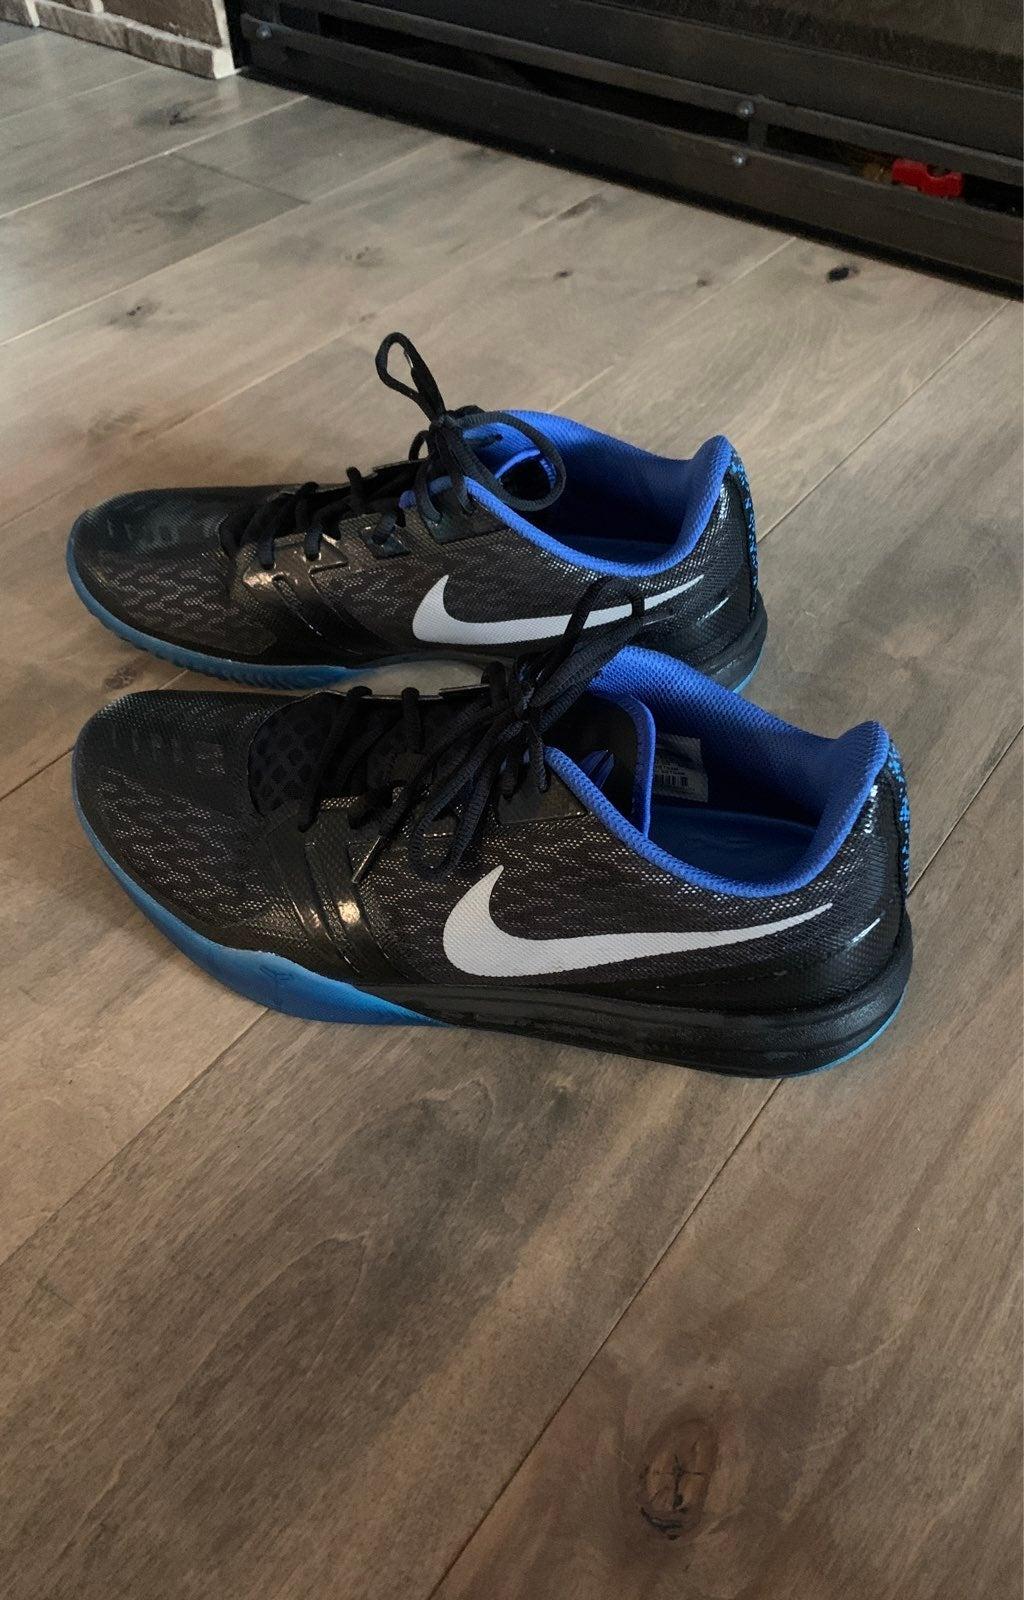 Nike KB Mentality Black/Metalic Silver/P